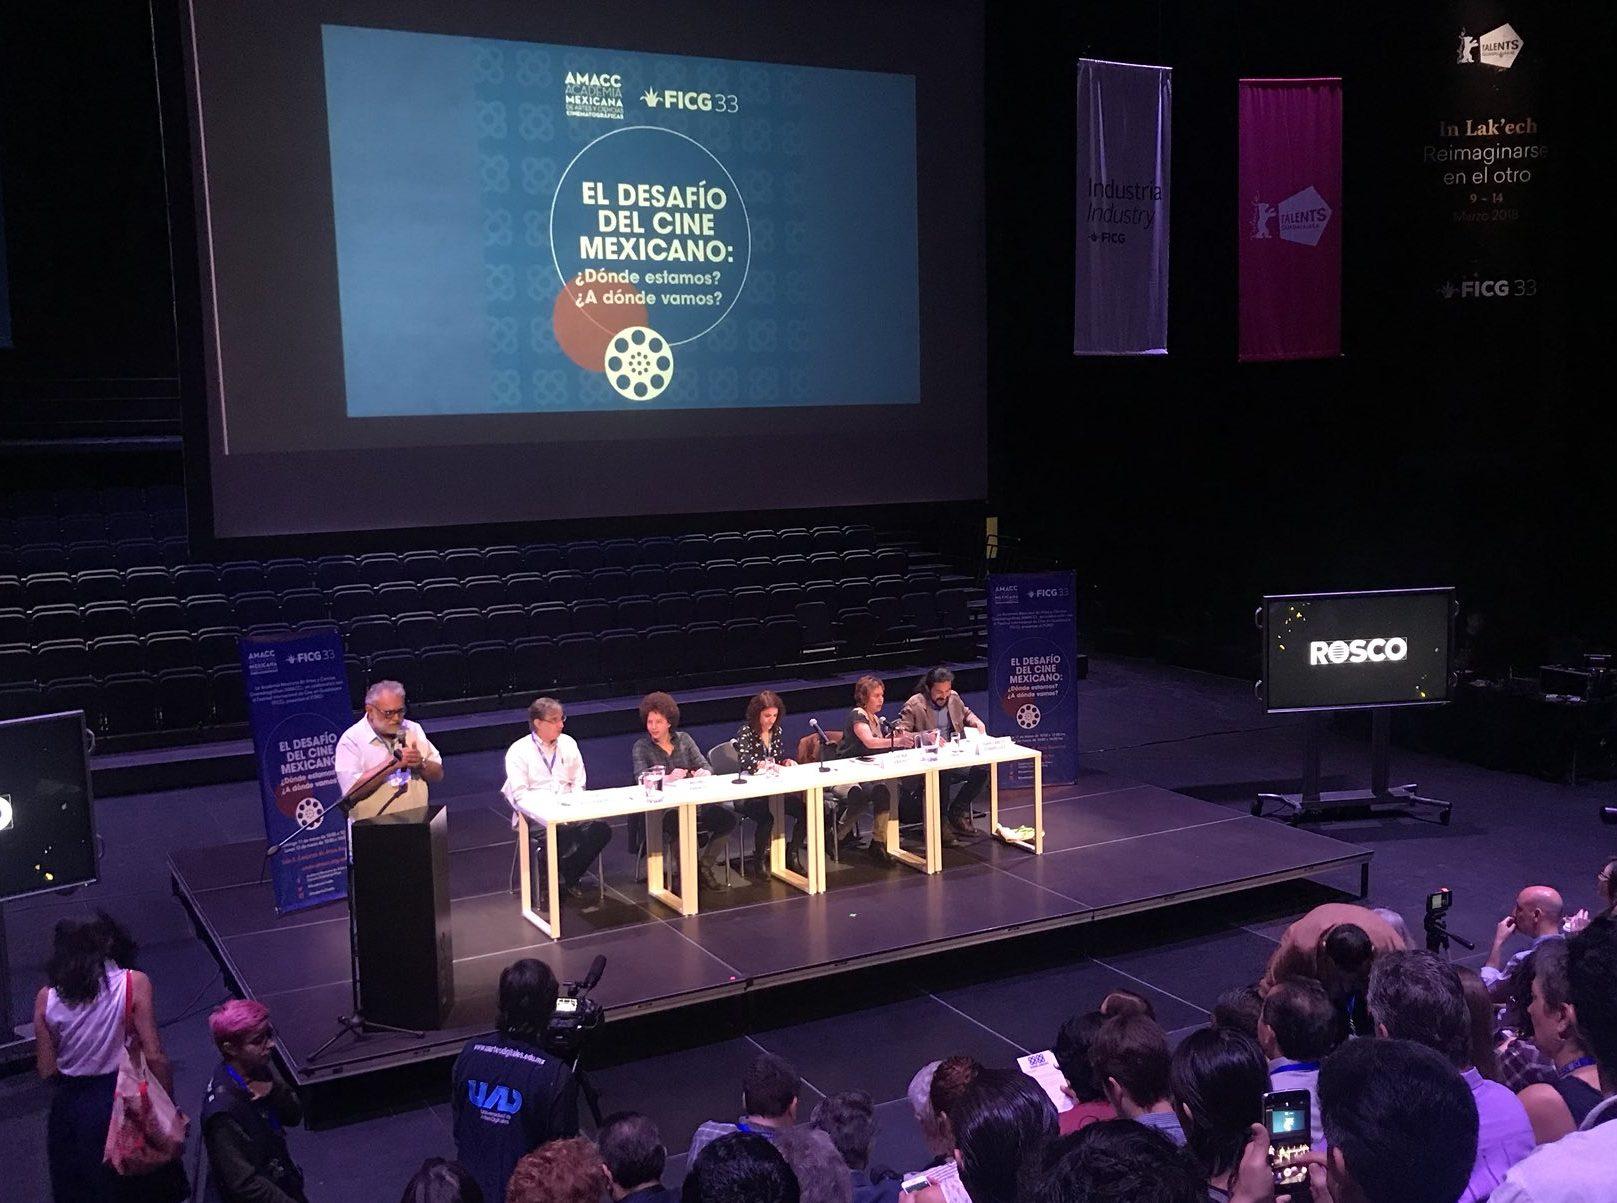 AMACC panel discussion at the Guadalajara International Film Festival